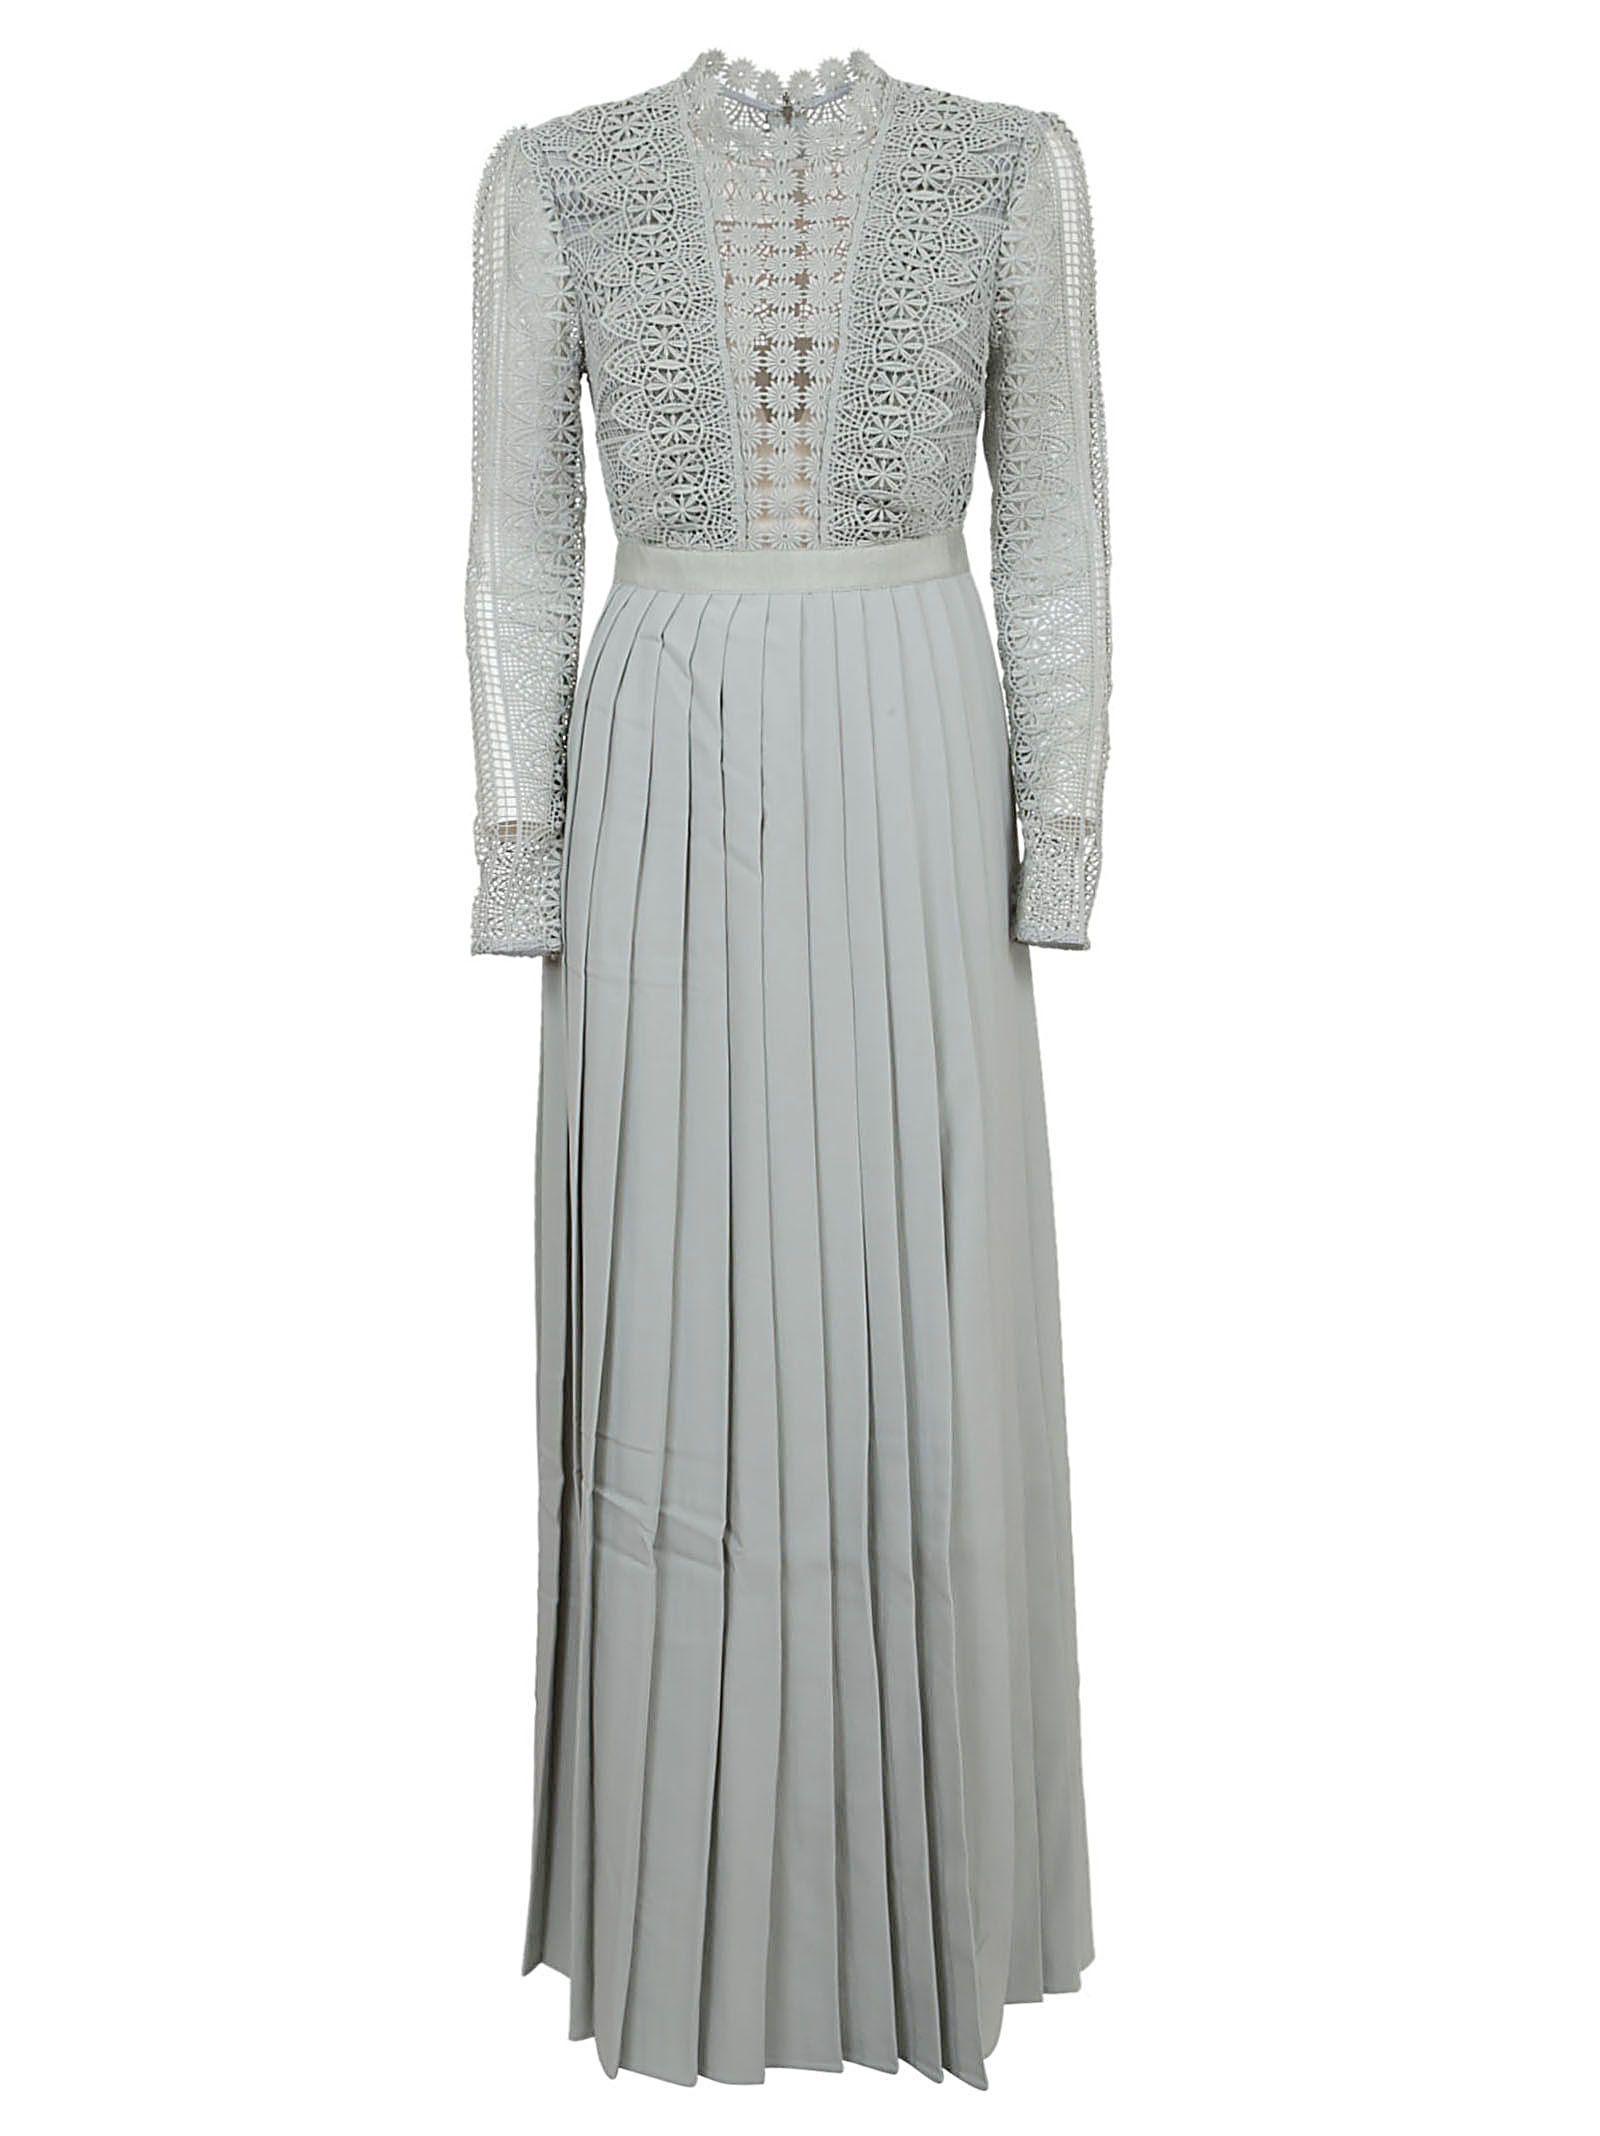 0c969d13bfa Self-Portrait Spiral Lace Maxi Dress In Grey Blue